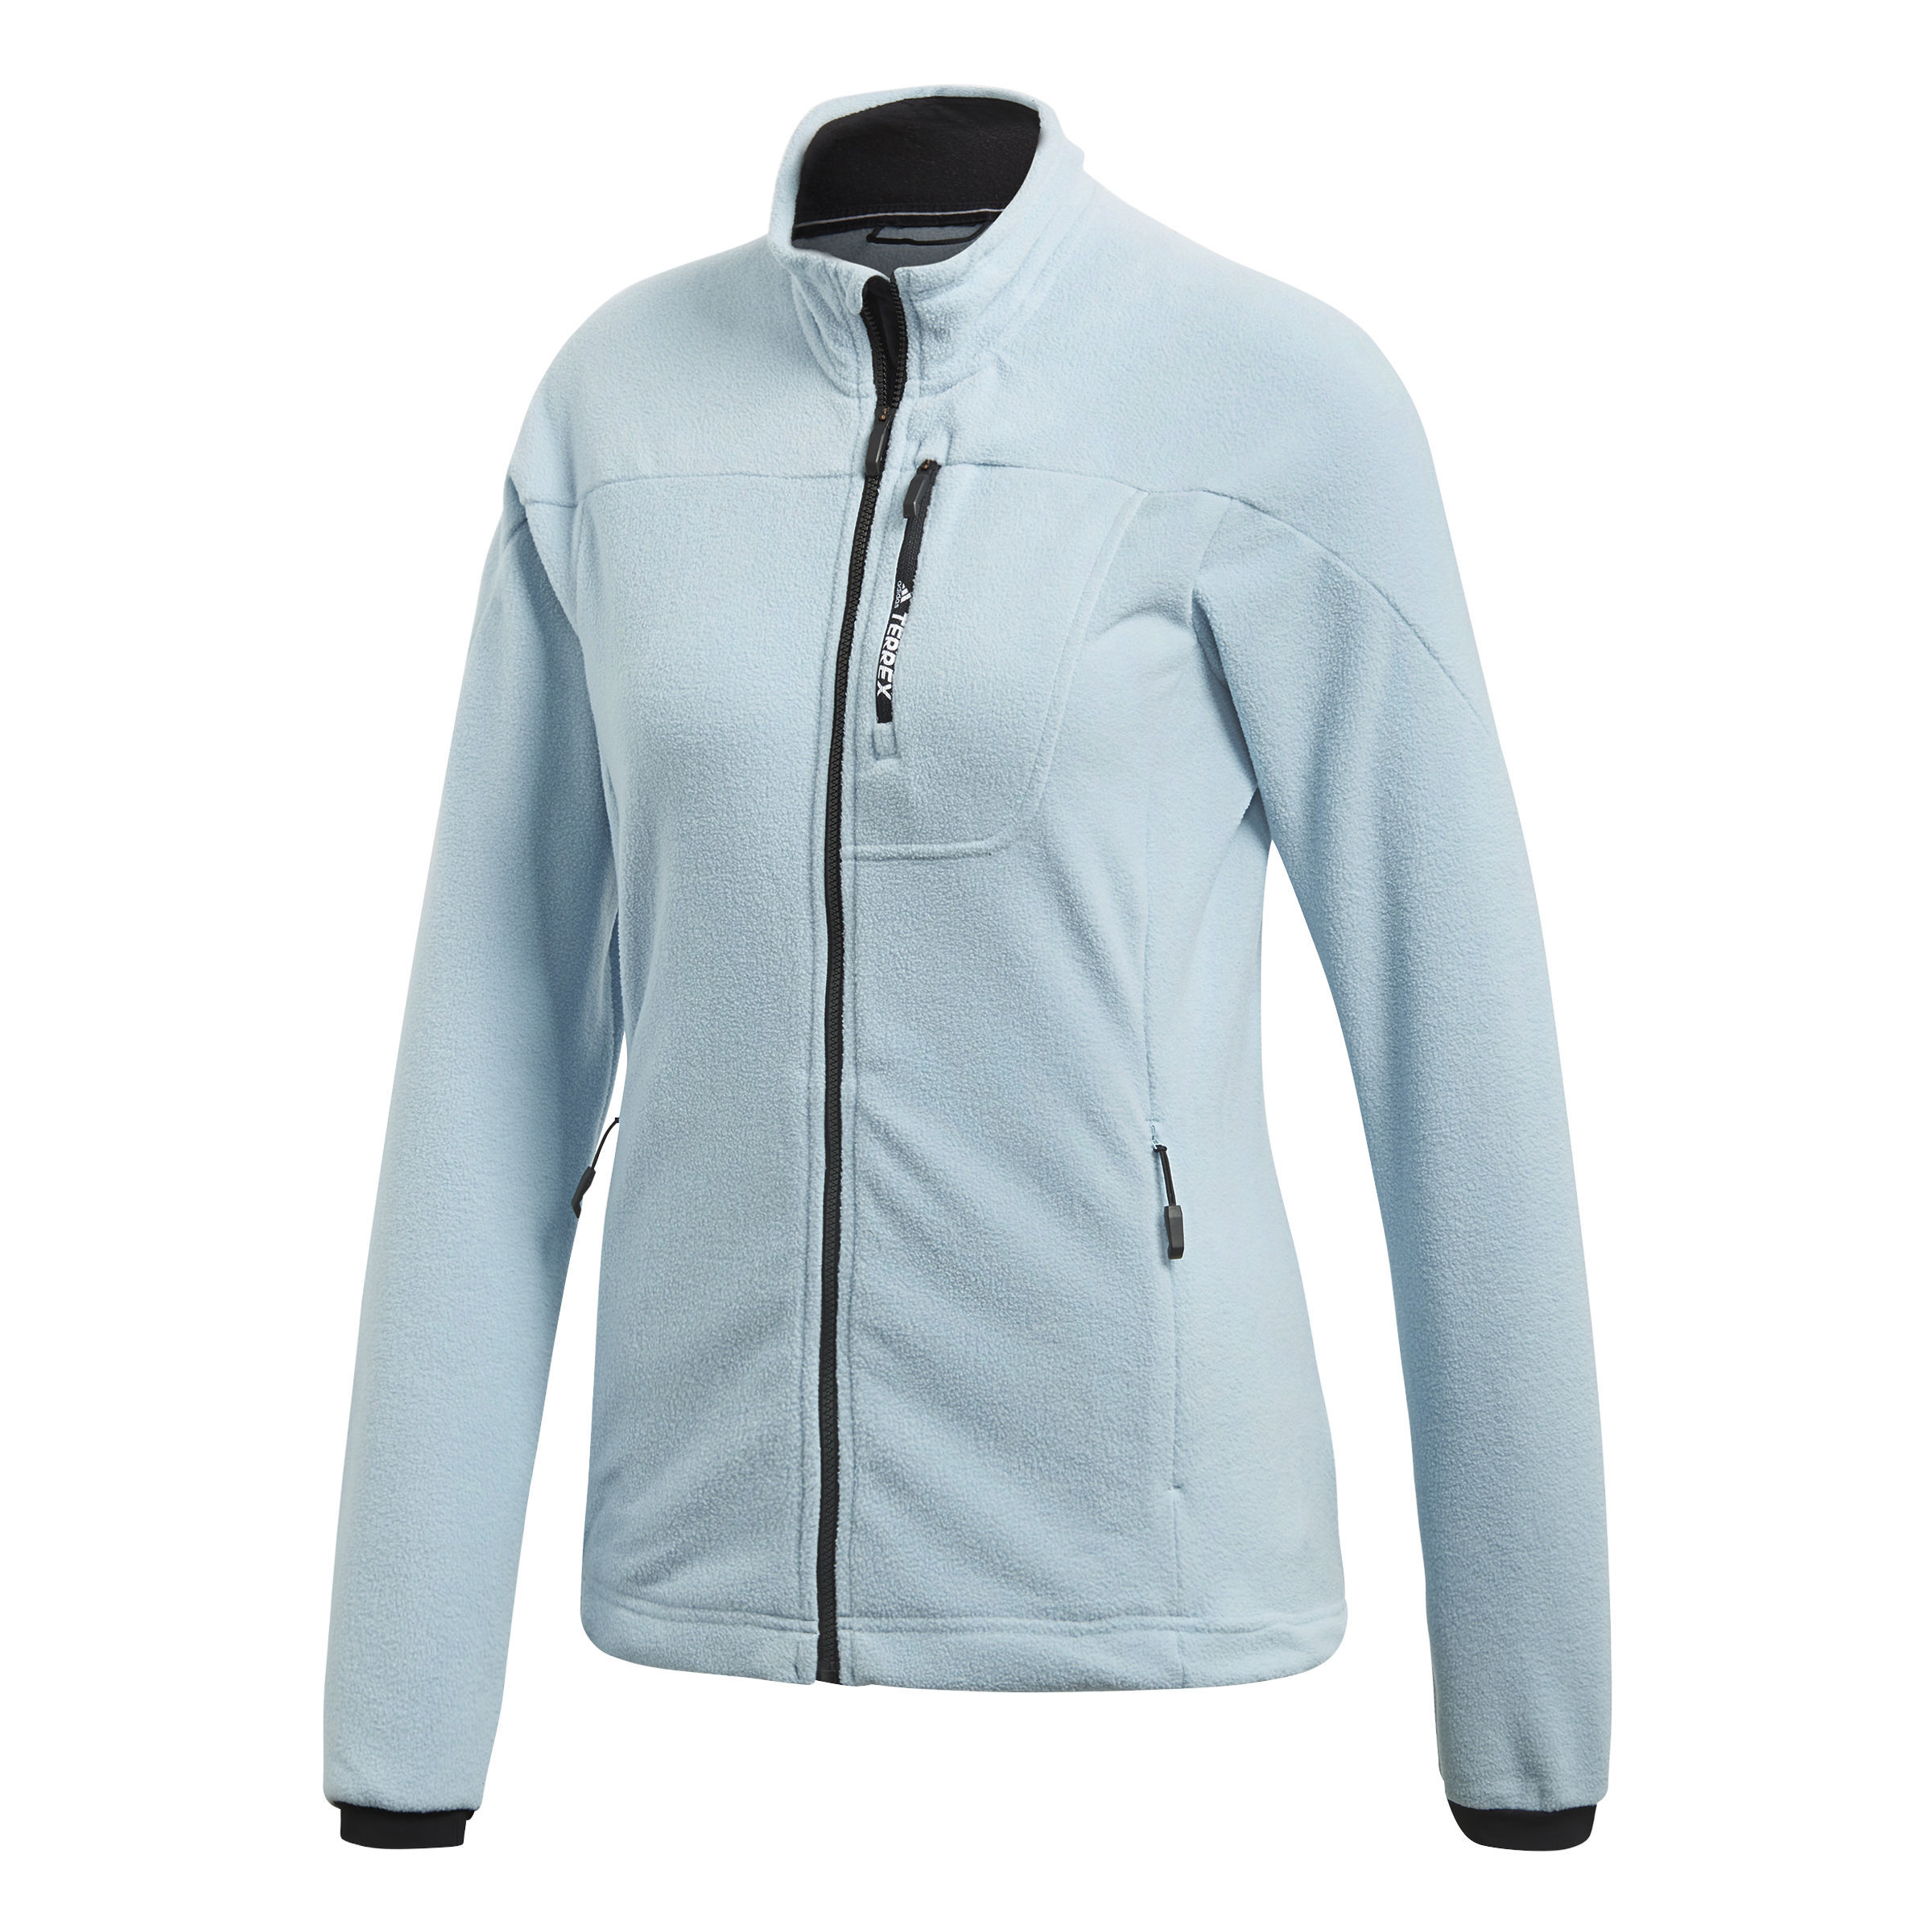 60143522dd Adidas Outdoor Terrex Tivid Fleece Jacket - Women's